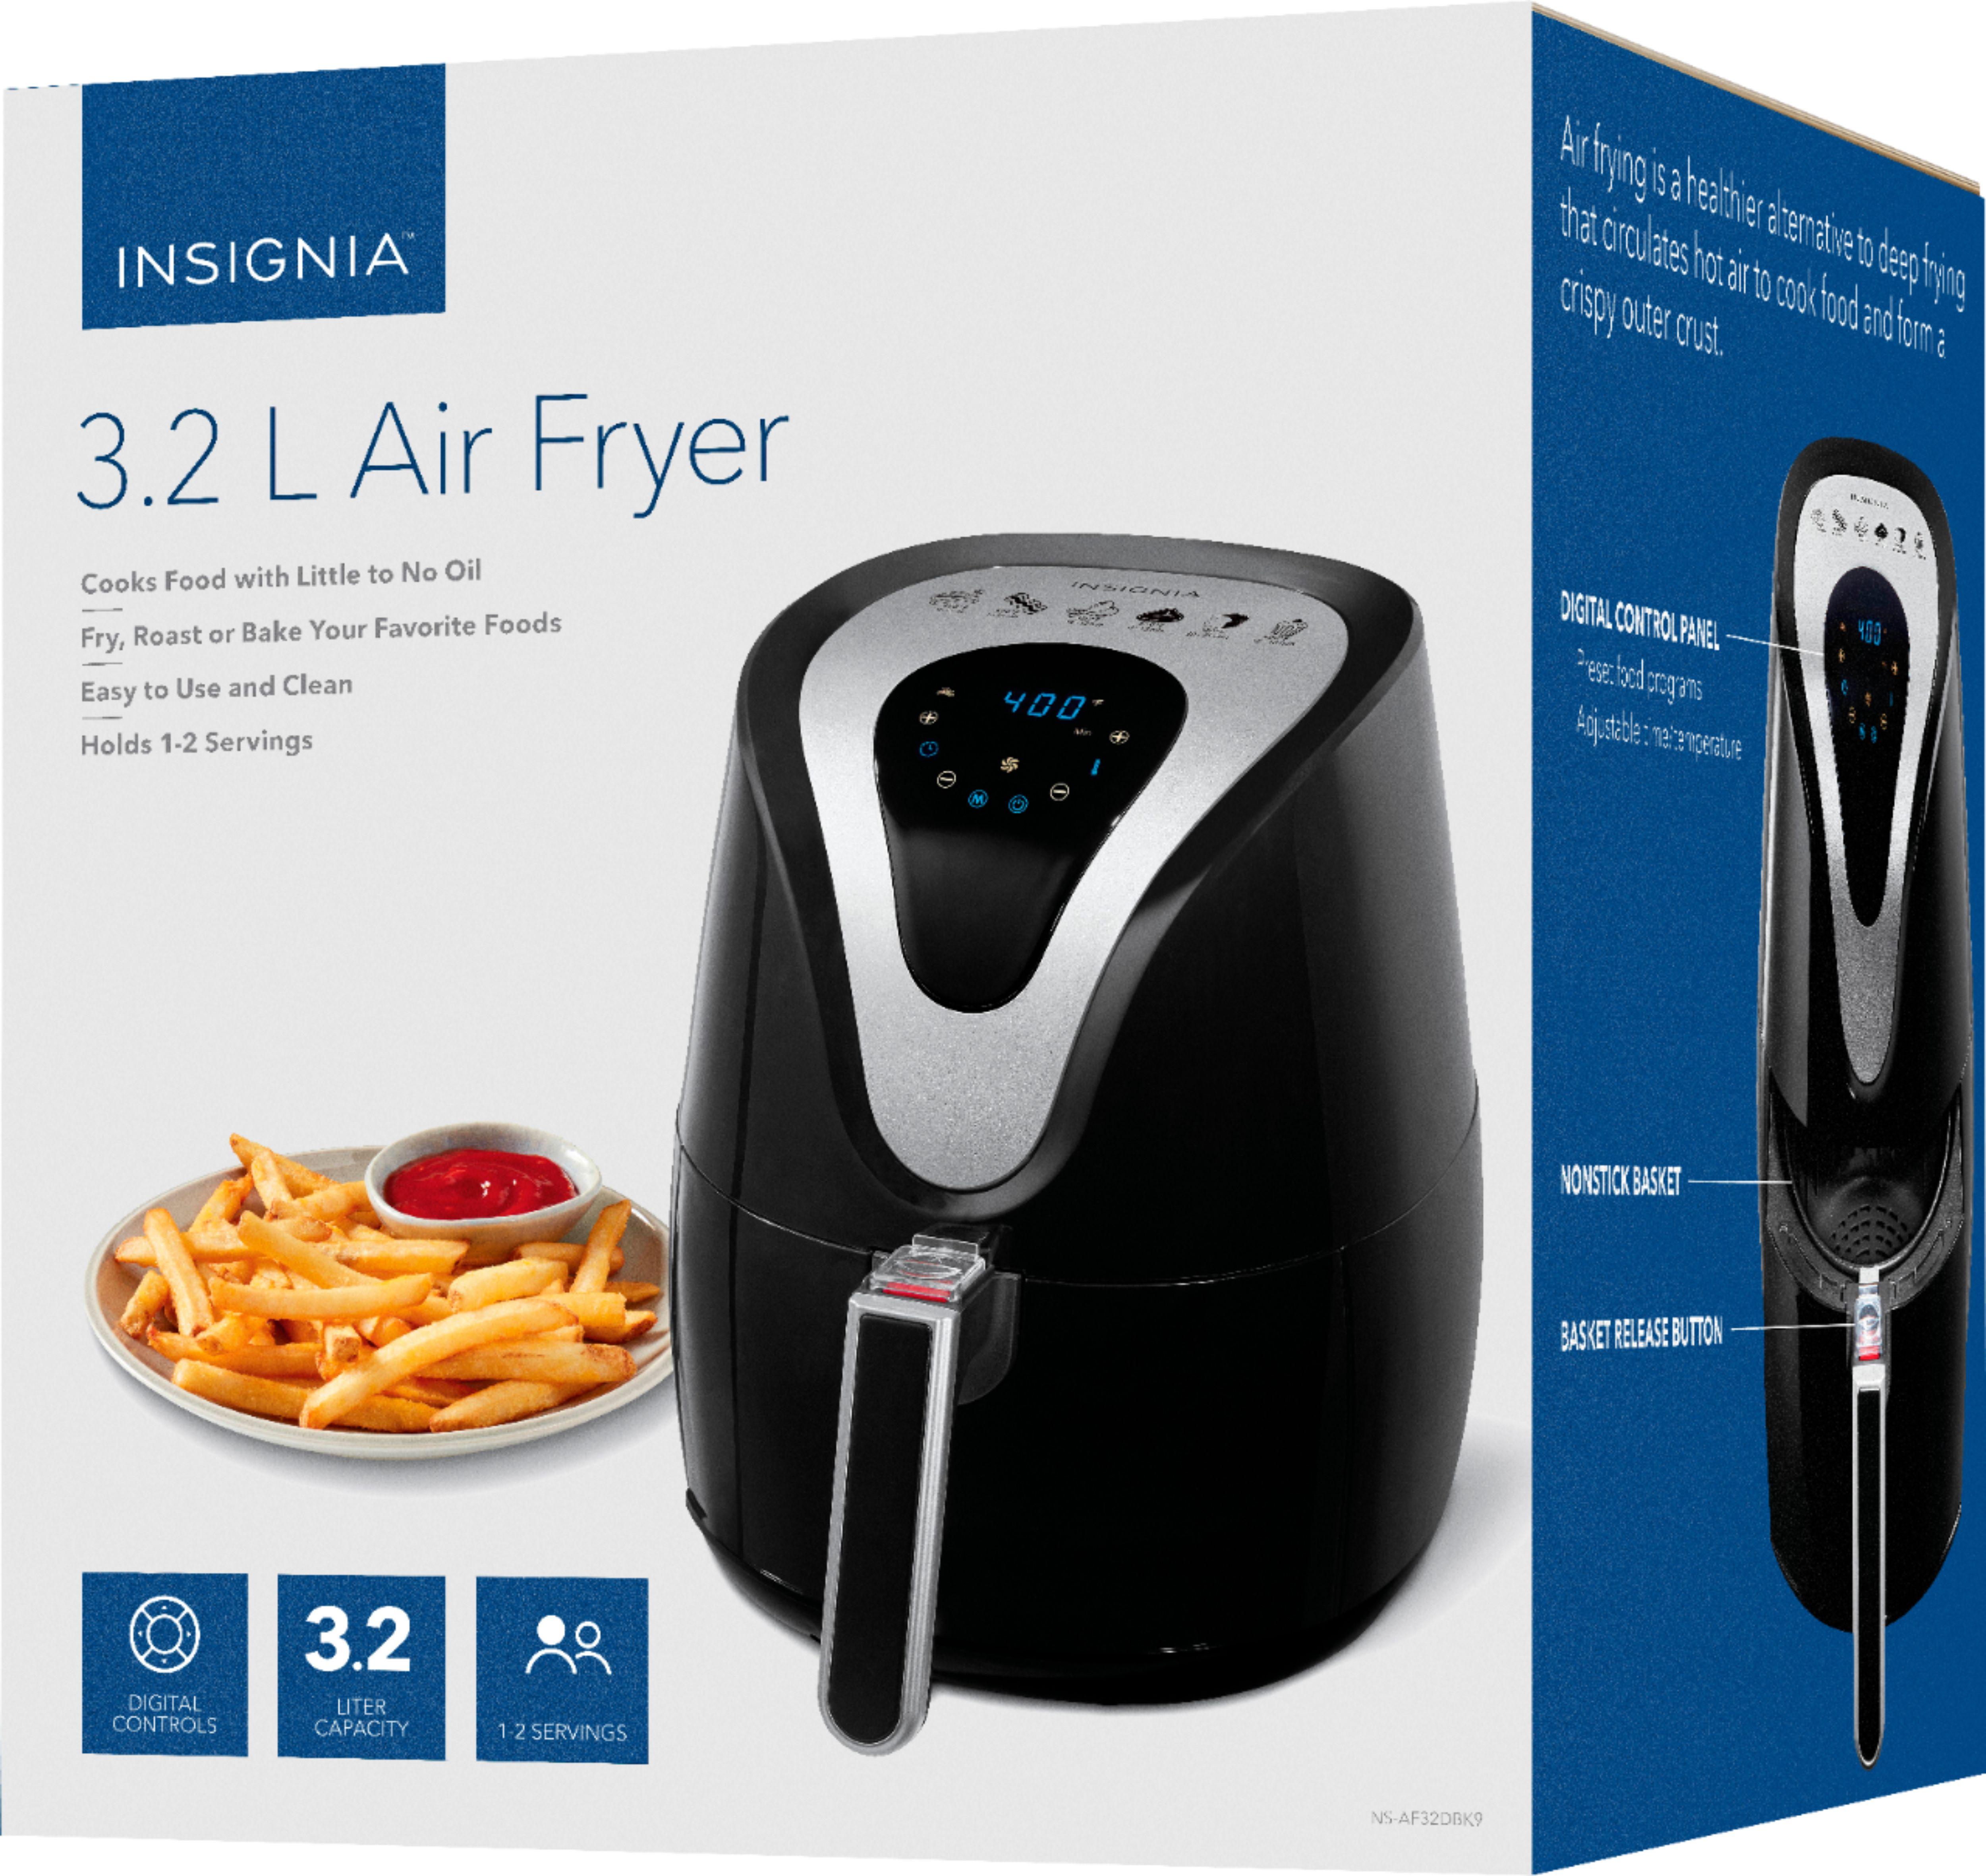 Insignia™ - 3.2qt Digital Air Fryer - Black @bestBuy $34.99  6.8qt / $49.99